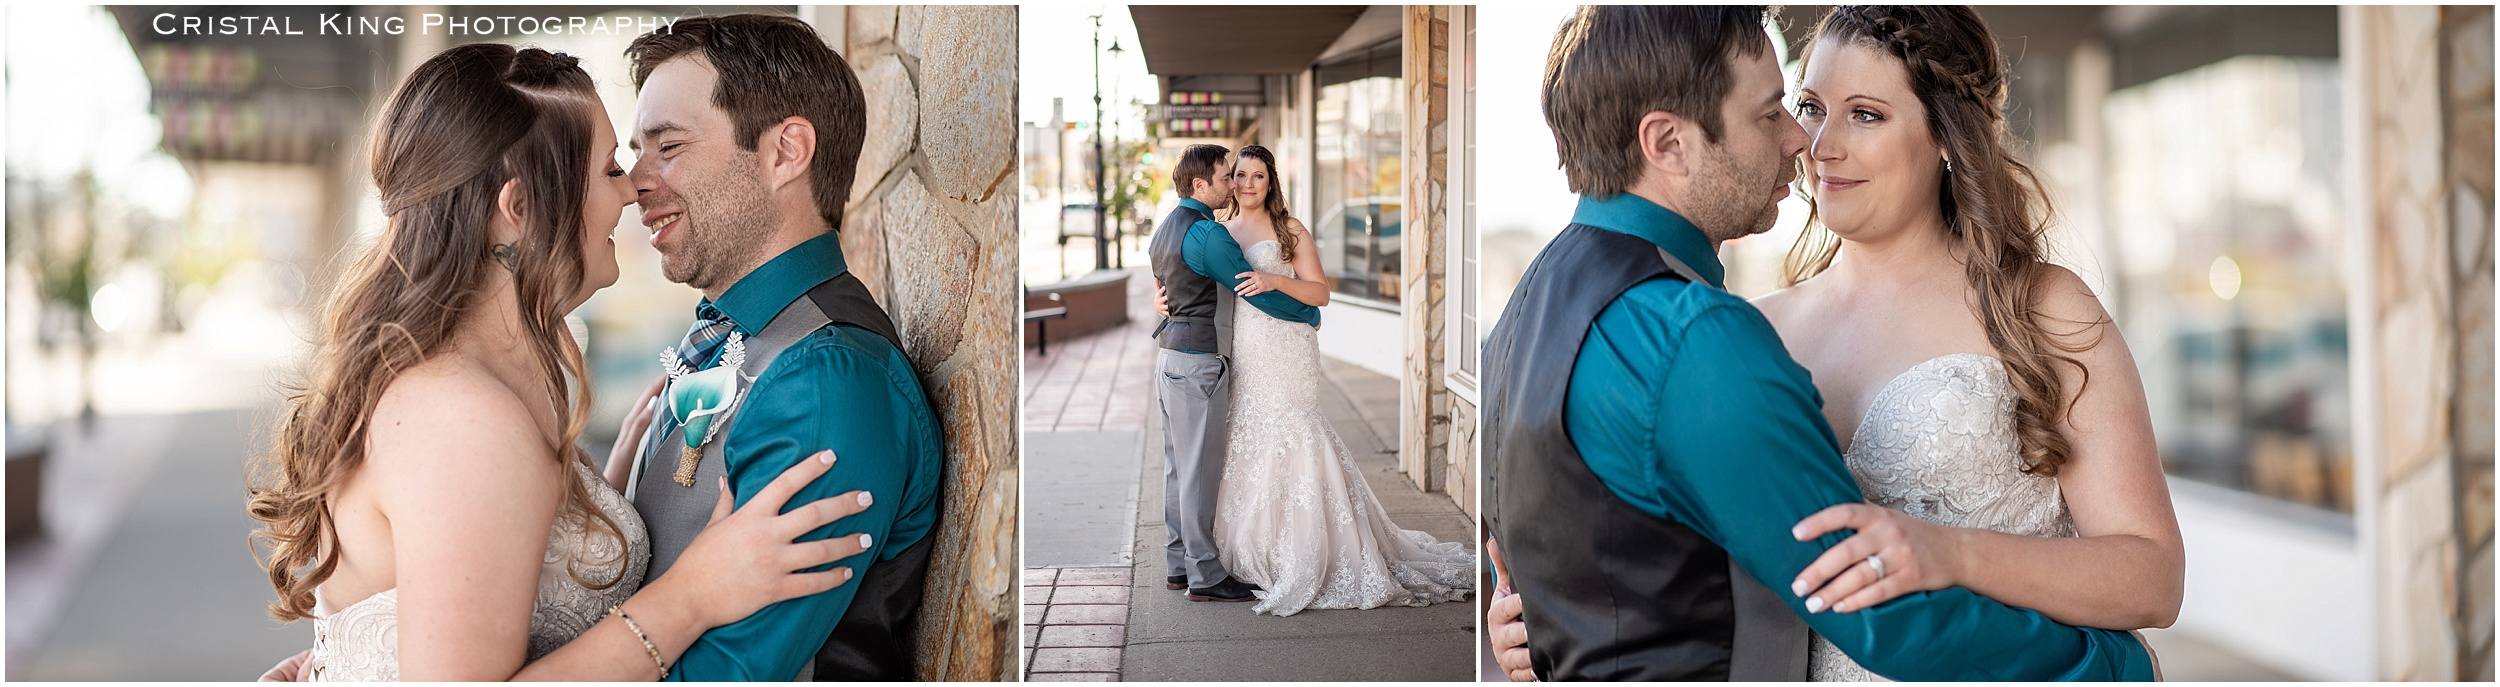 Myla & Grant Wedding-156.jpg